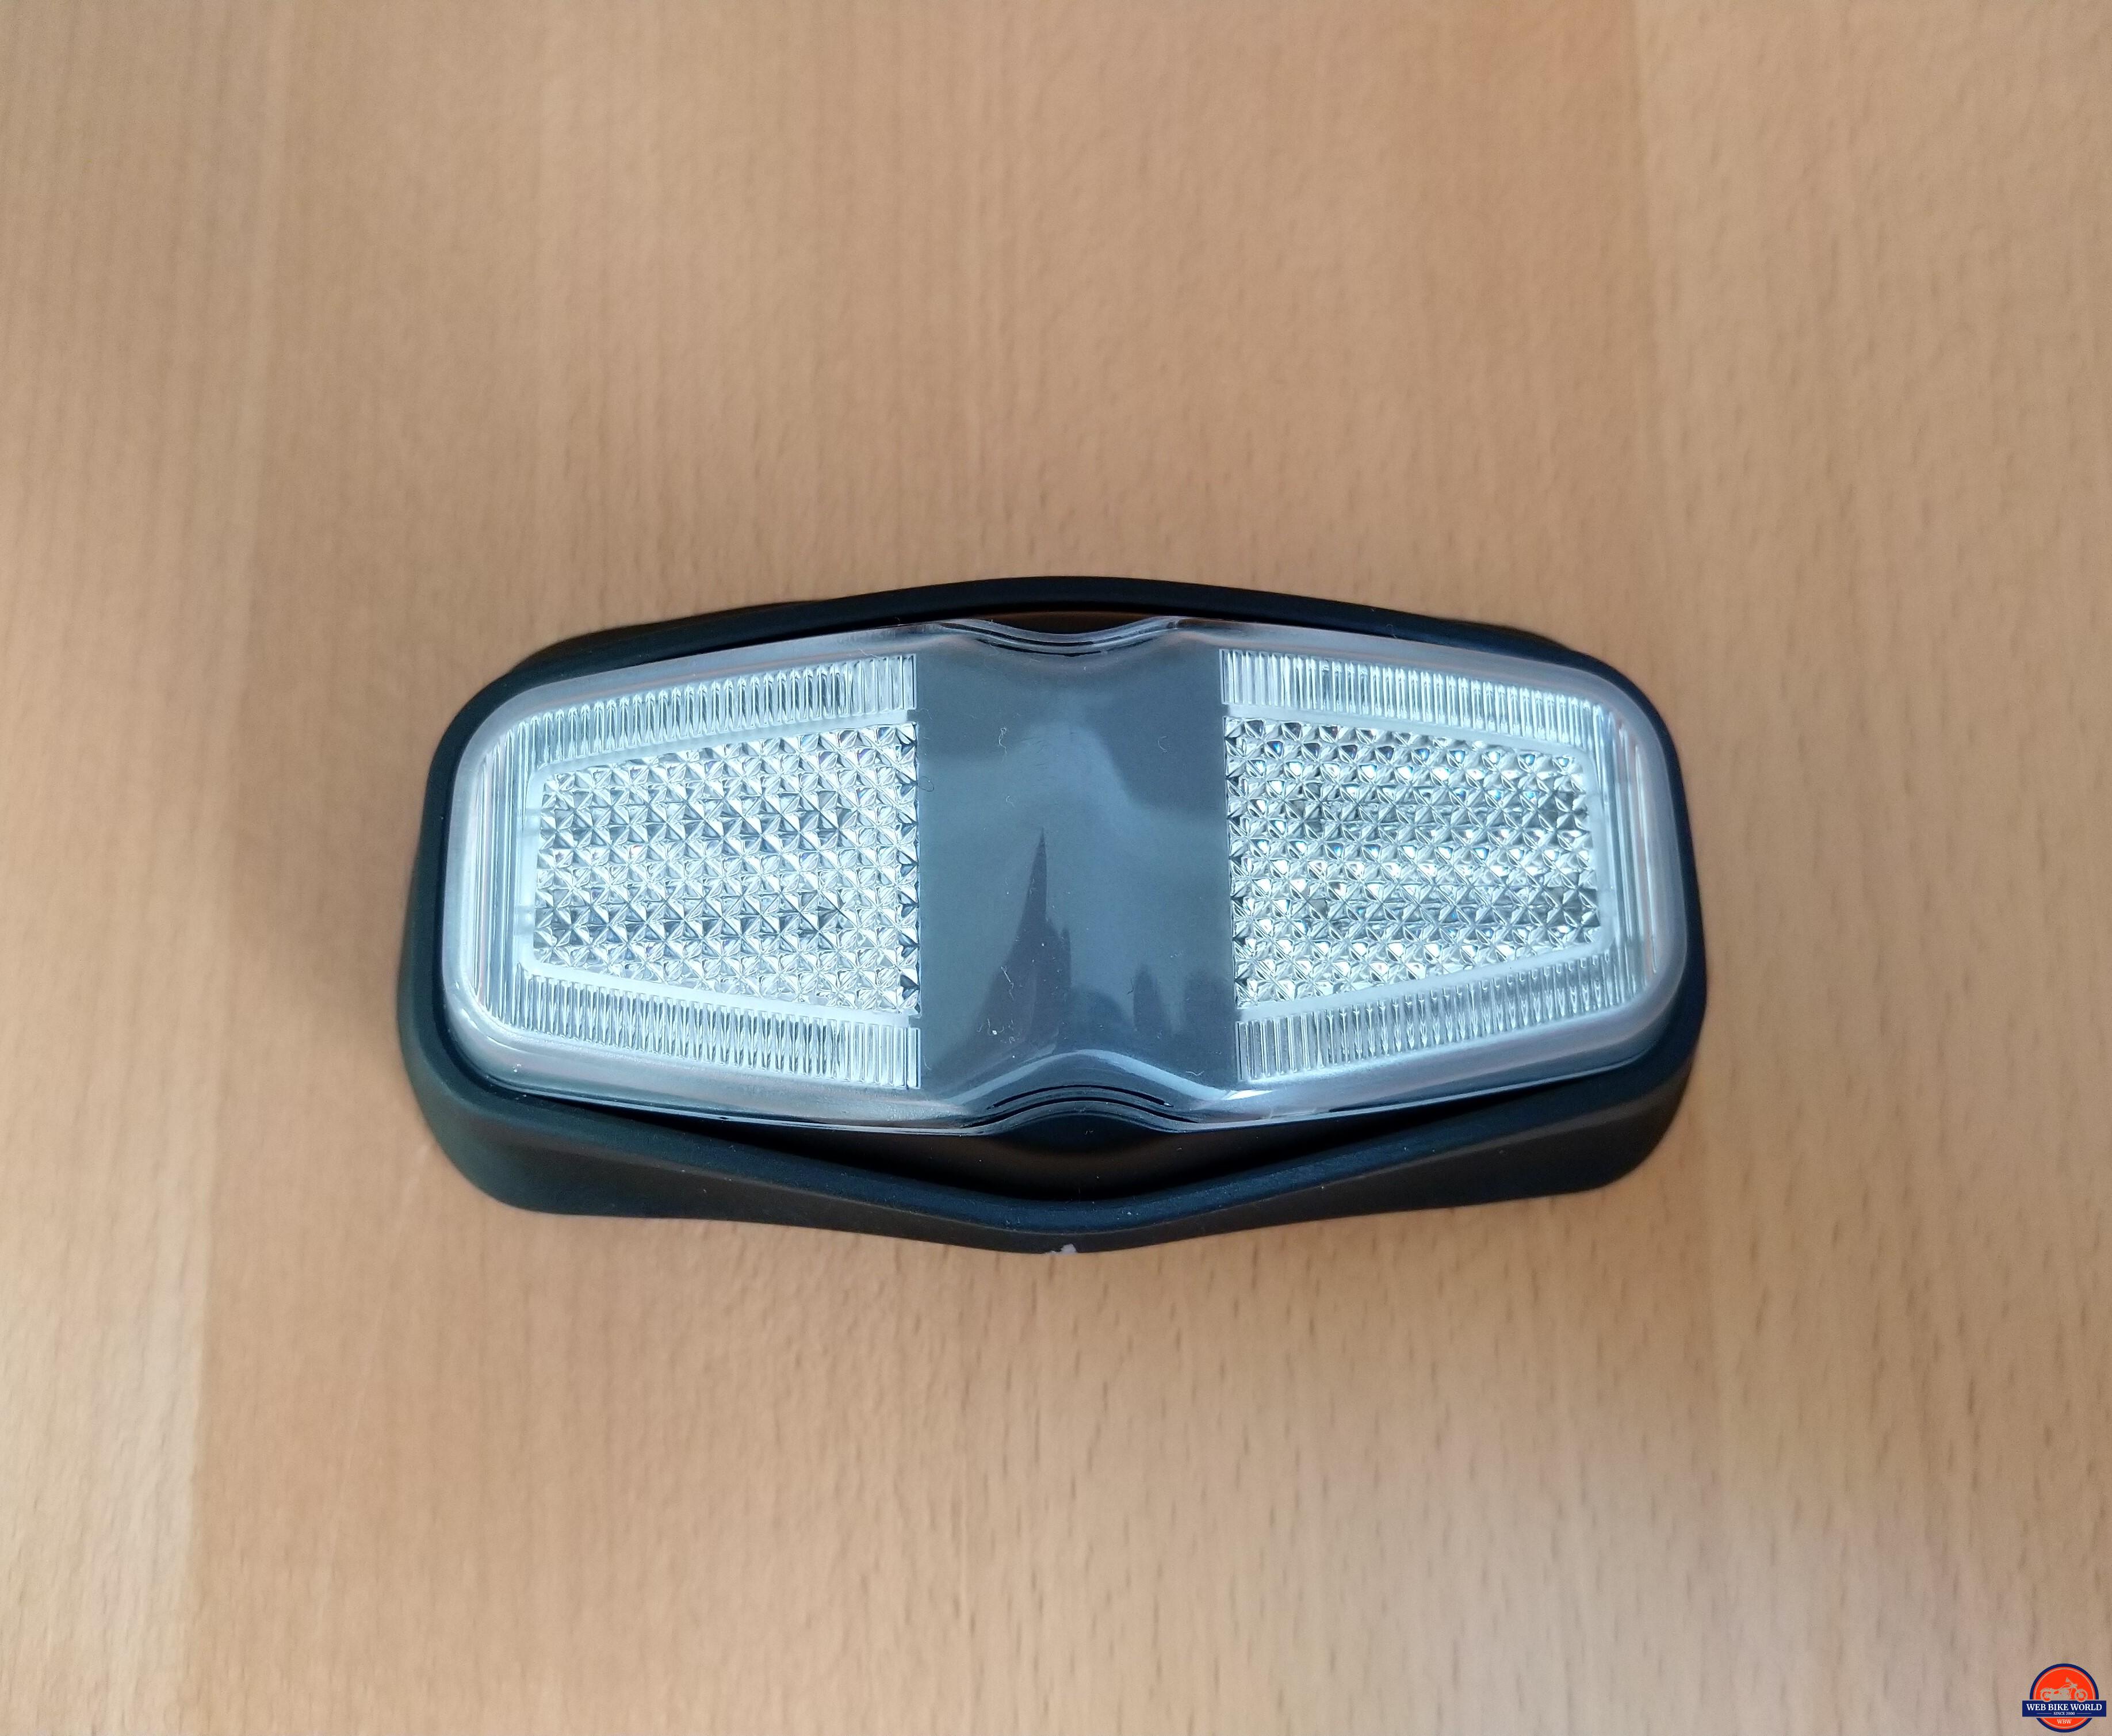 inView, Component, helmet module, LED face